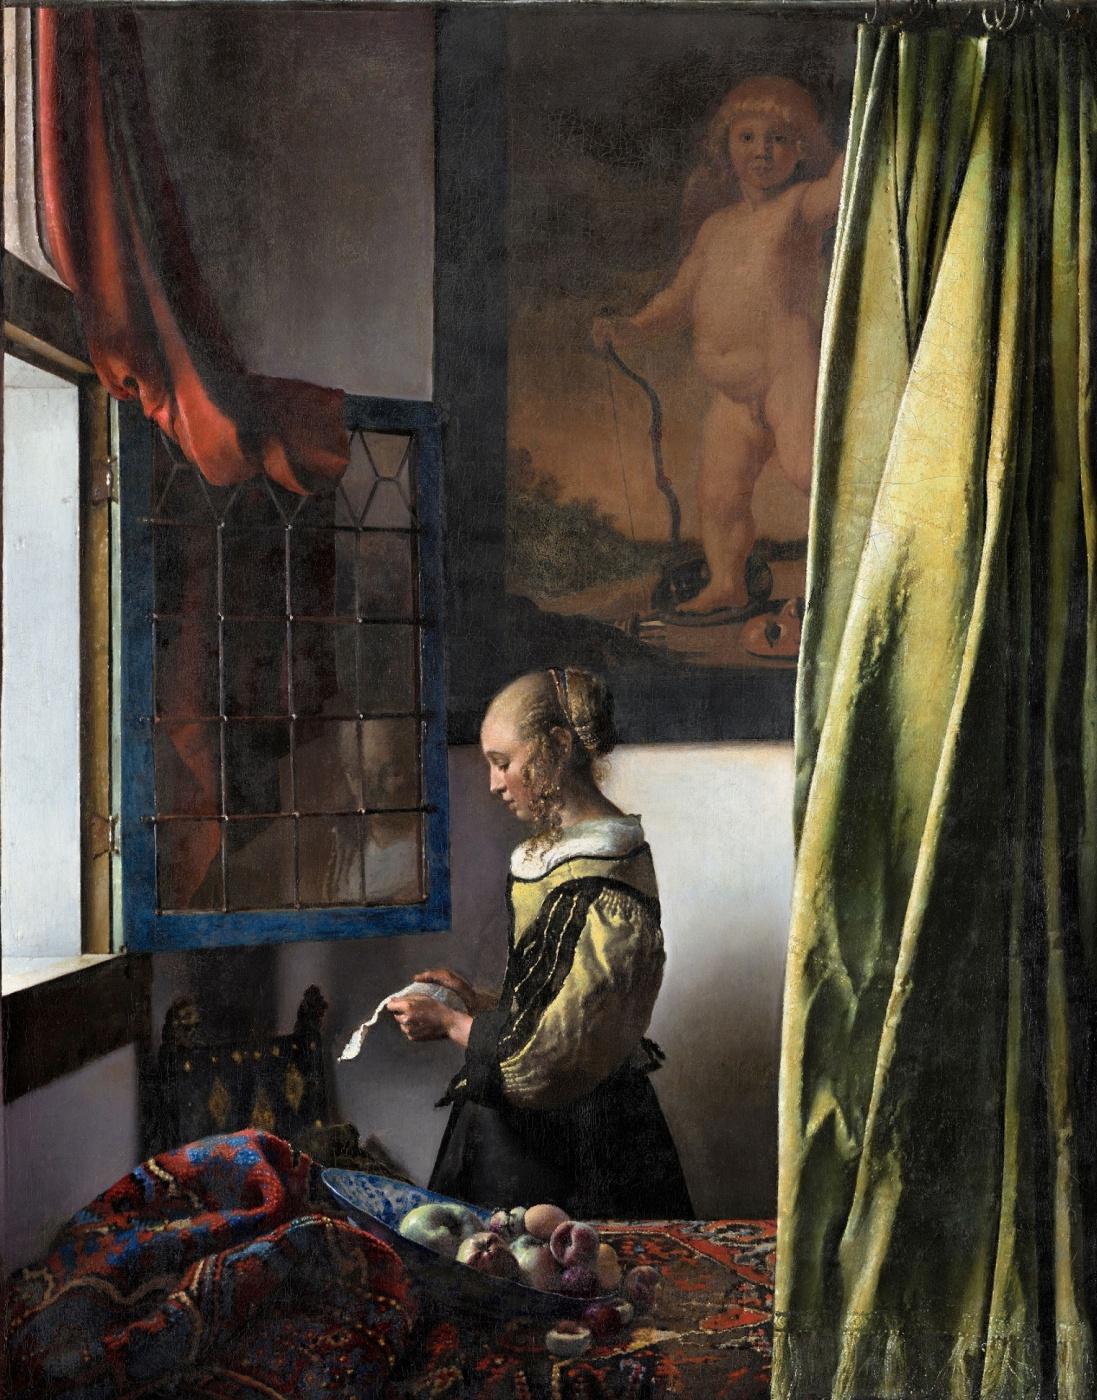 Jan Vermeer. Girl a letter at an open window